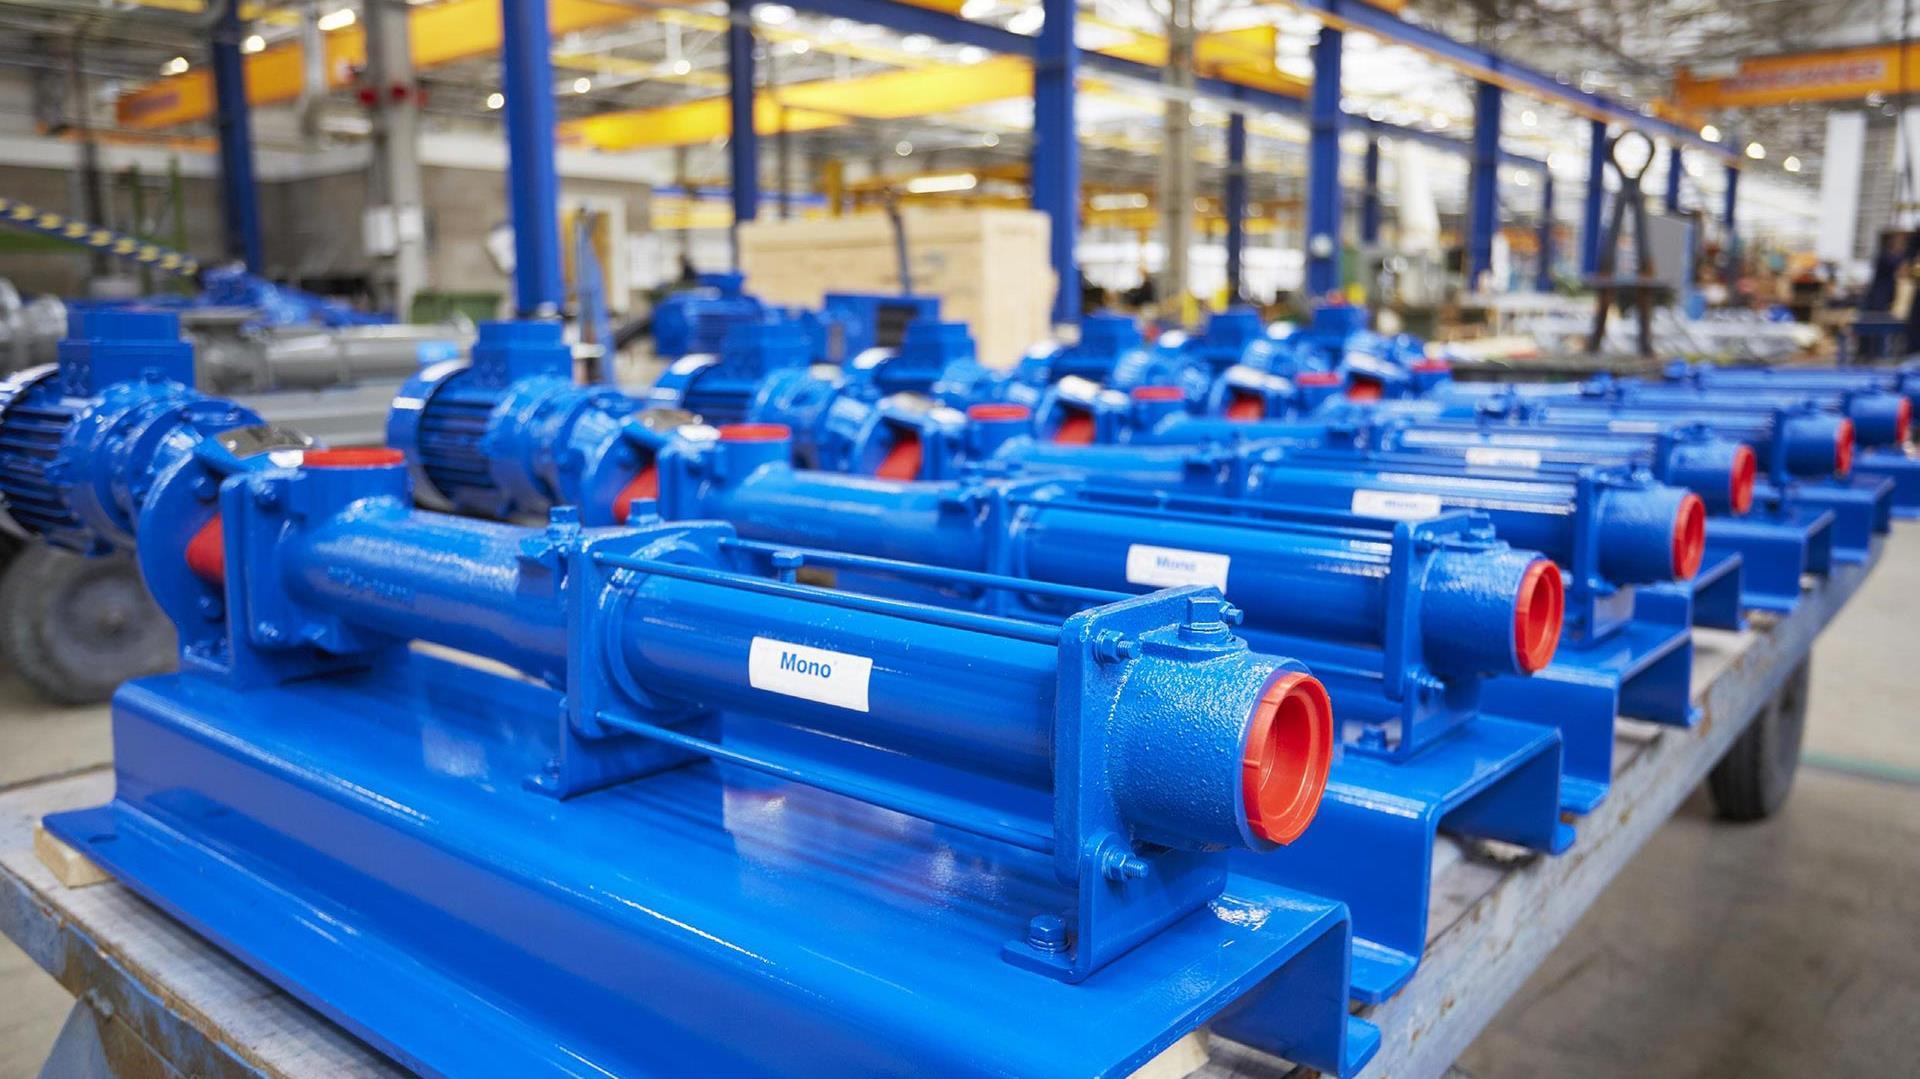 Photograph of blue Epsilon vertical pumps in a warehouse environment.